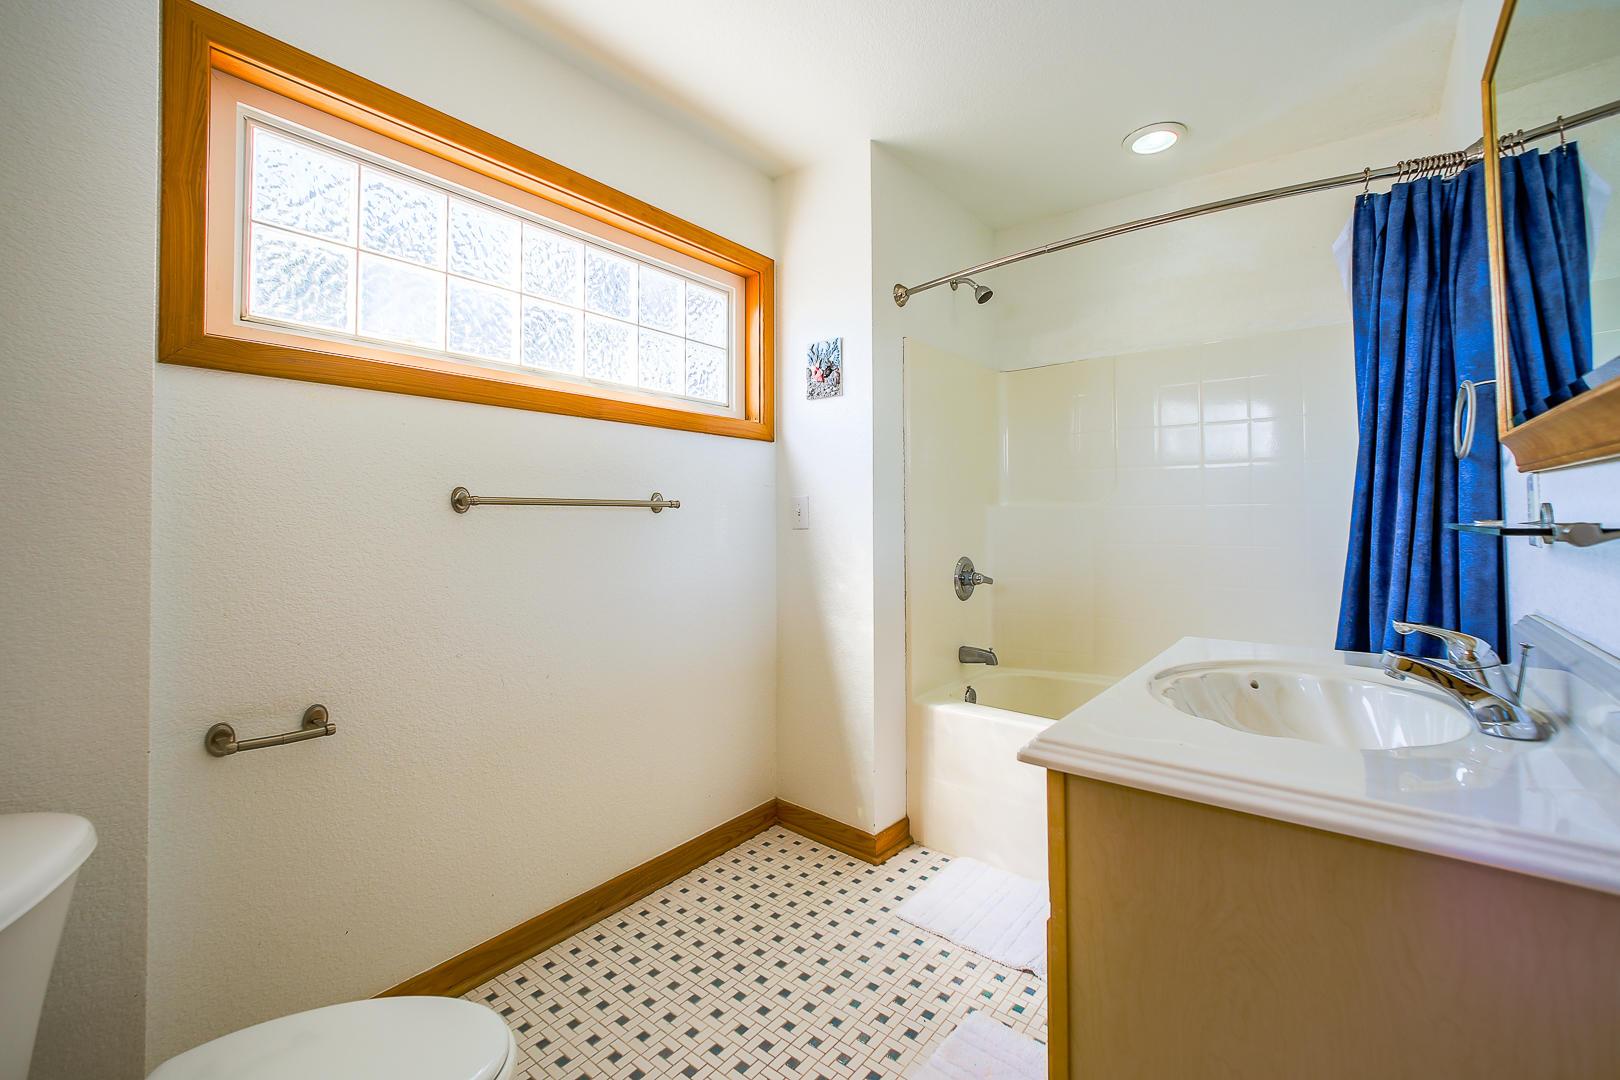 Ground level Master Bedroom #2 private bath